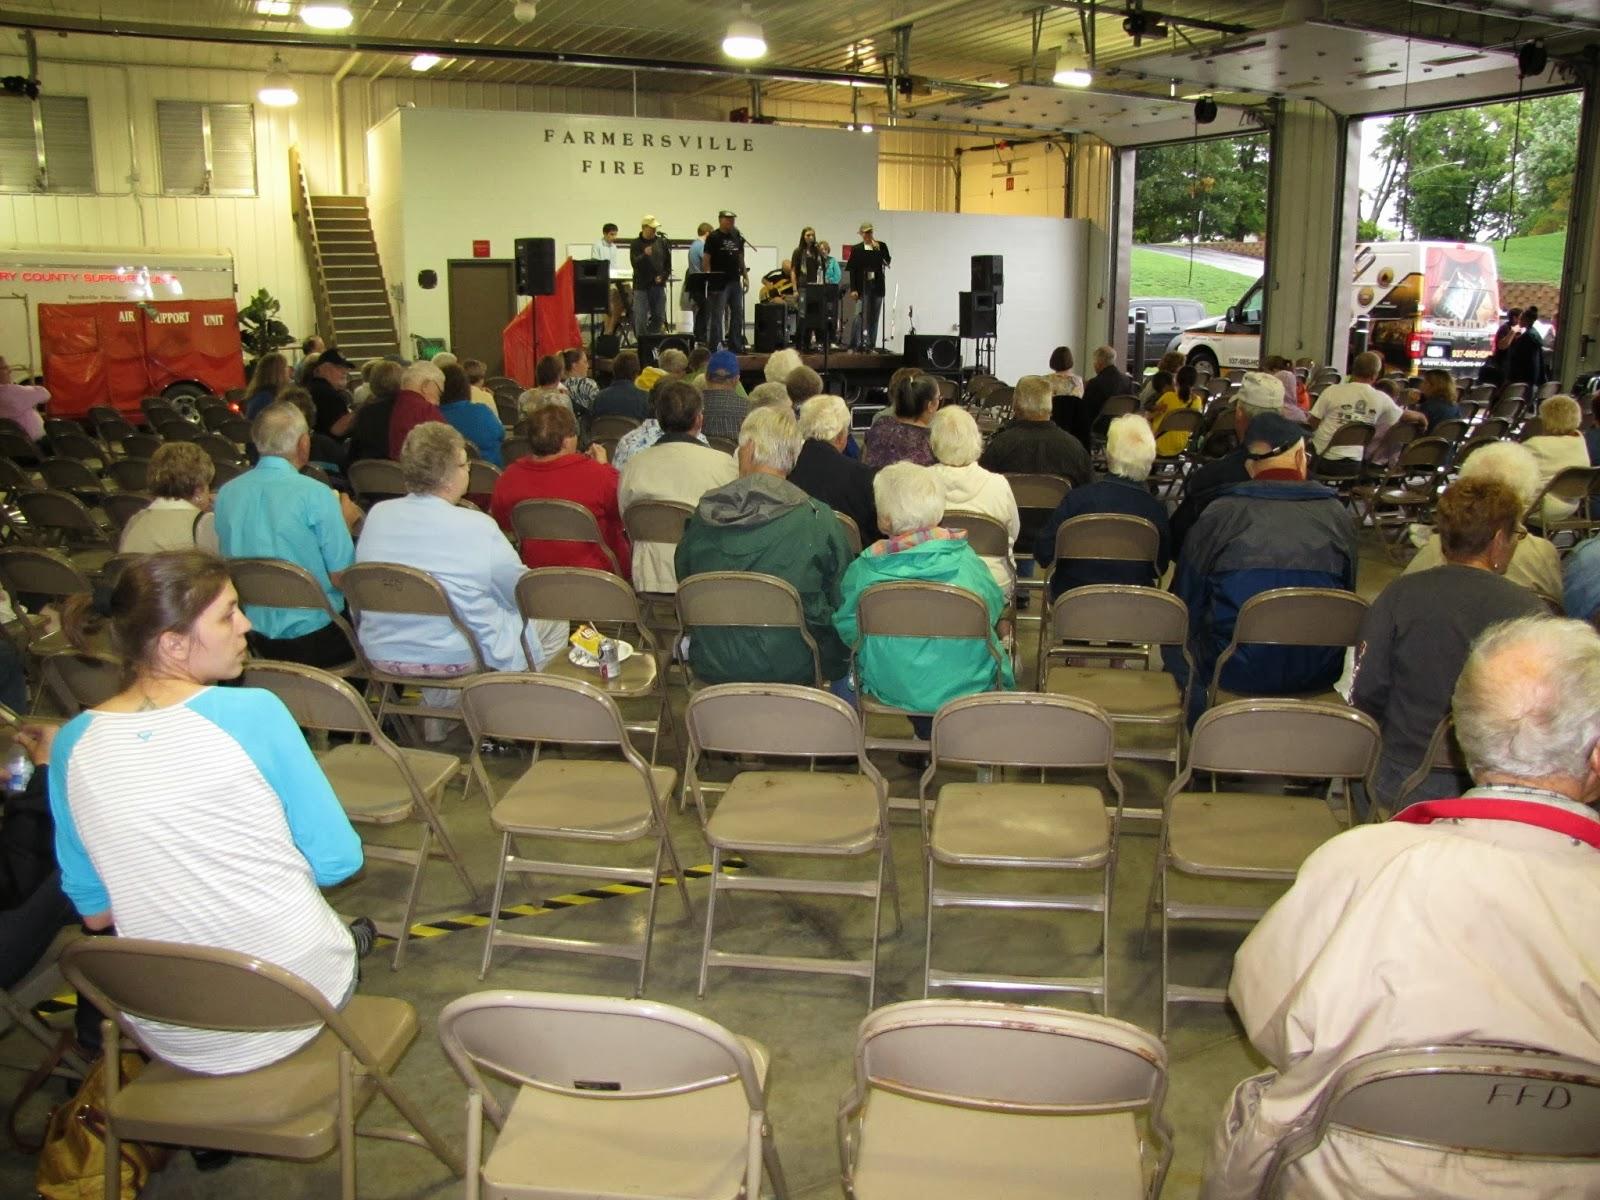 Pinehaven - Farmersville, Ohio: Kevin Patton Benefit